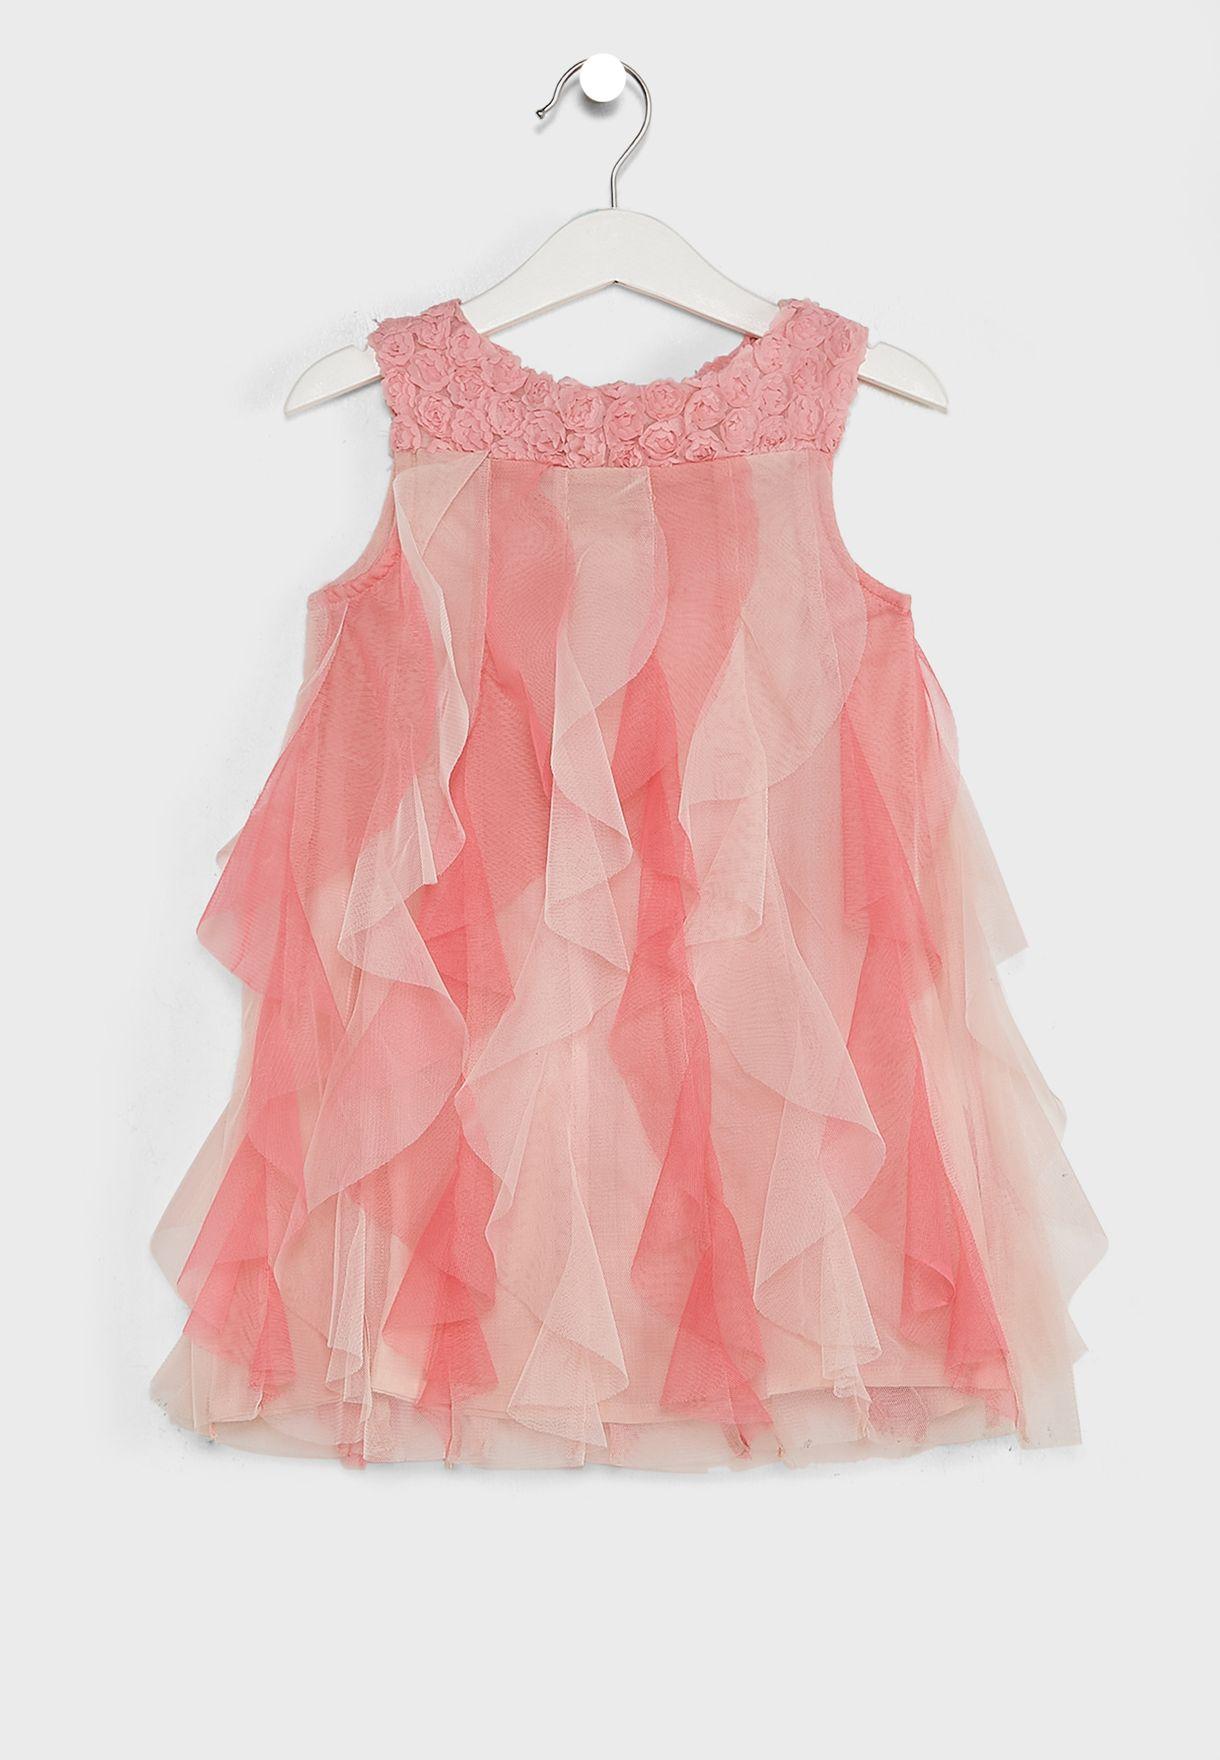 Detailed Ruffle Dress